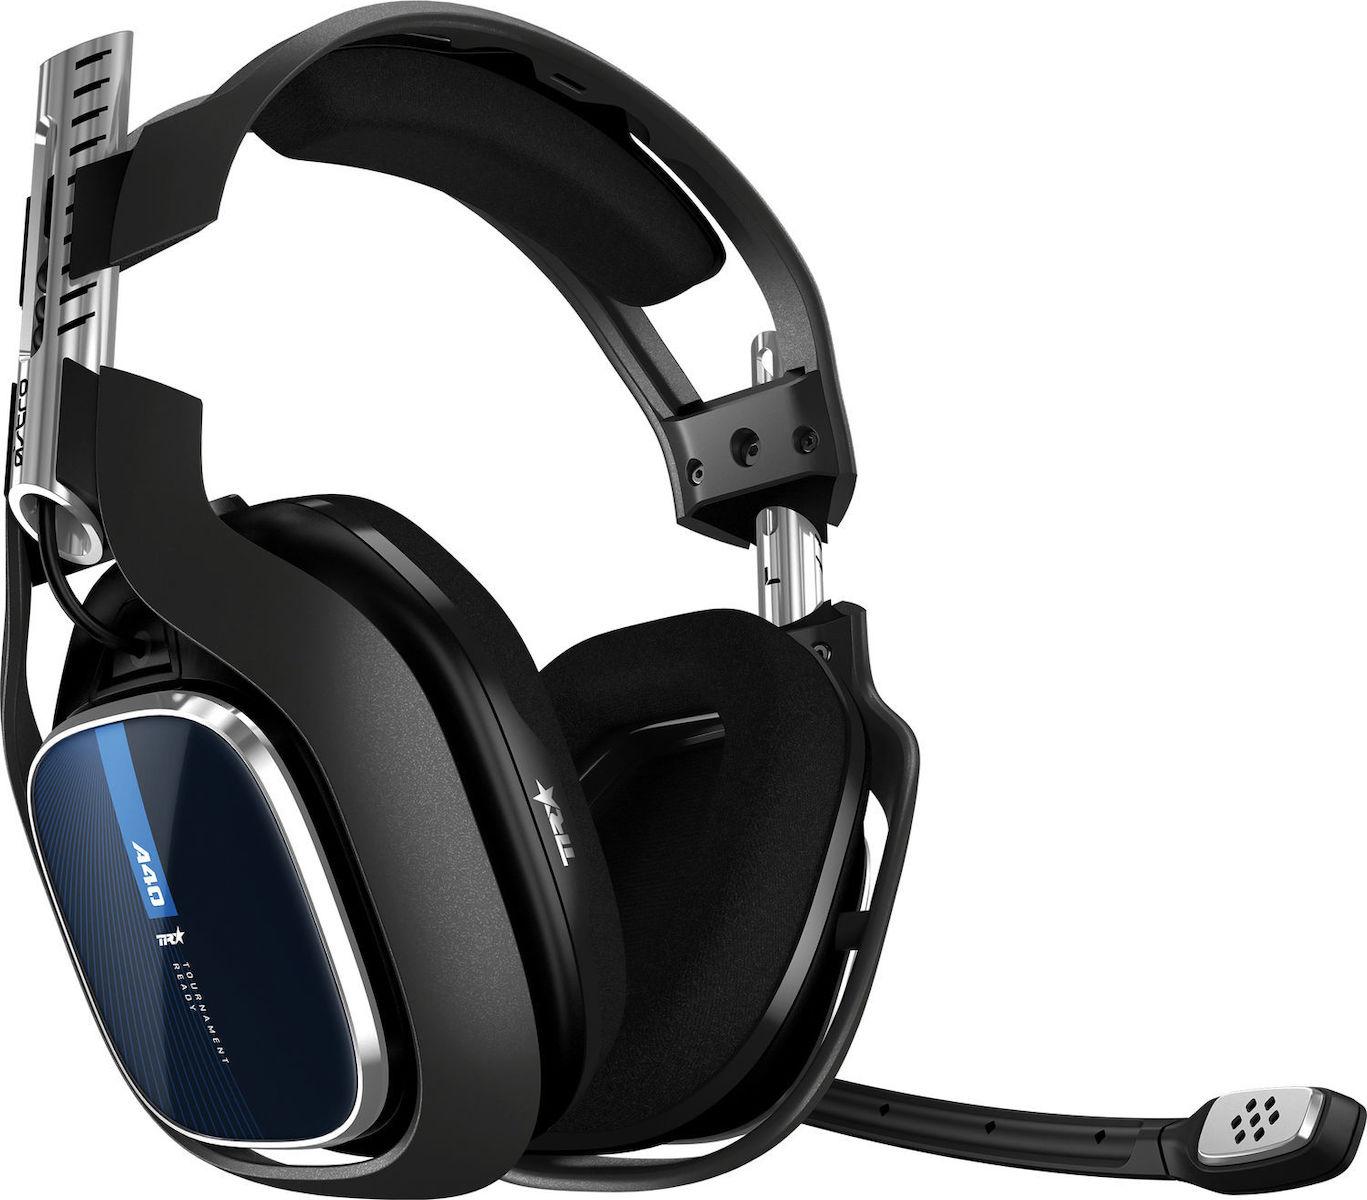 Astro A40 TR Gaming Headset (Black & Blue) (939-001664) - Πληρωμή και σε έως 36 Δόσεις!!!